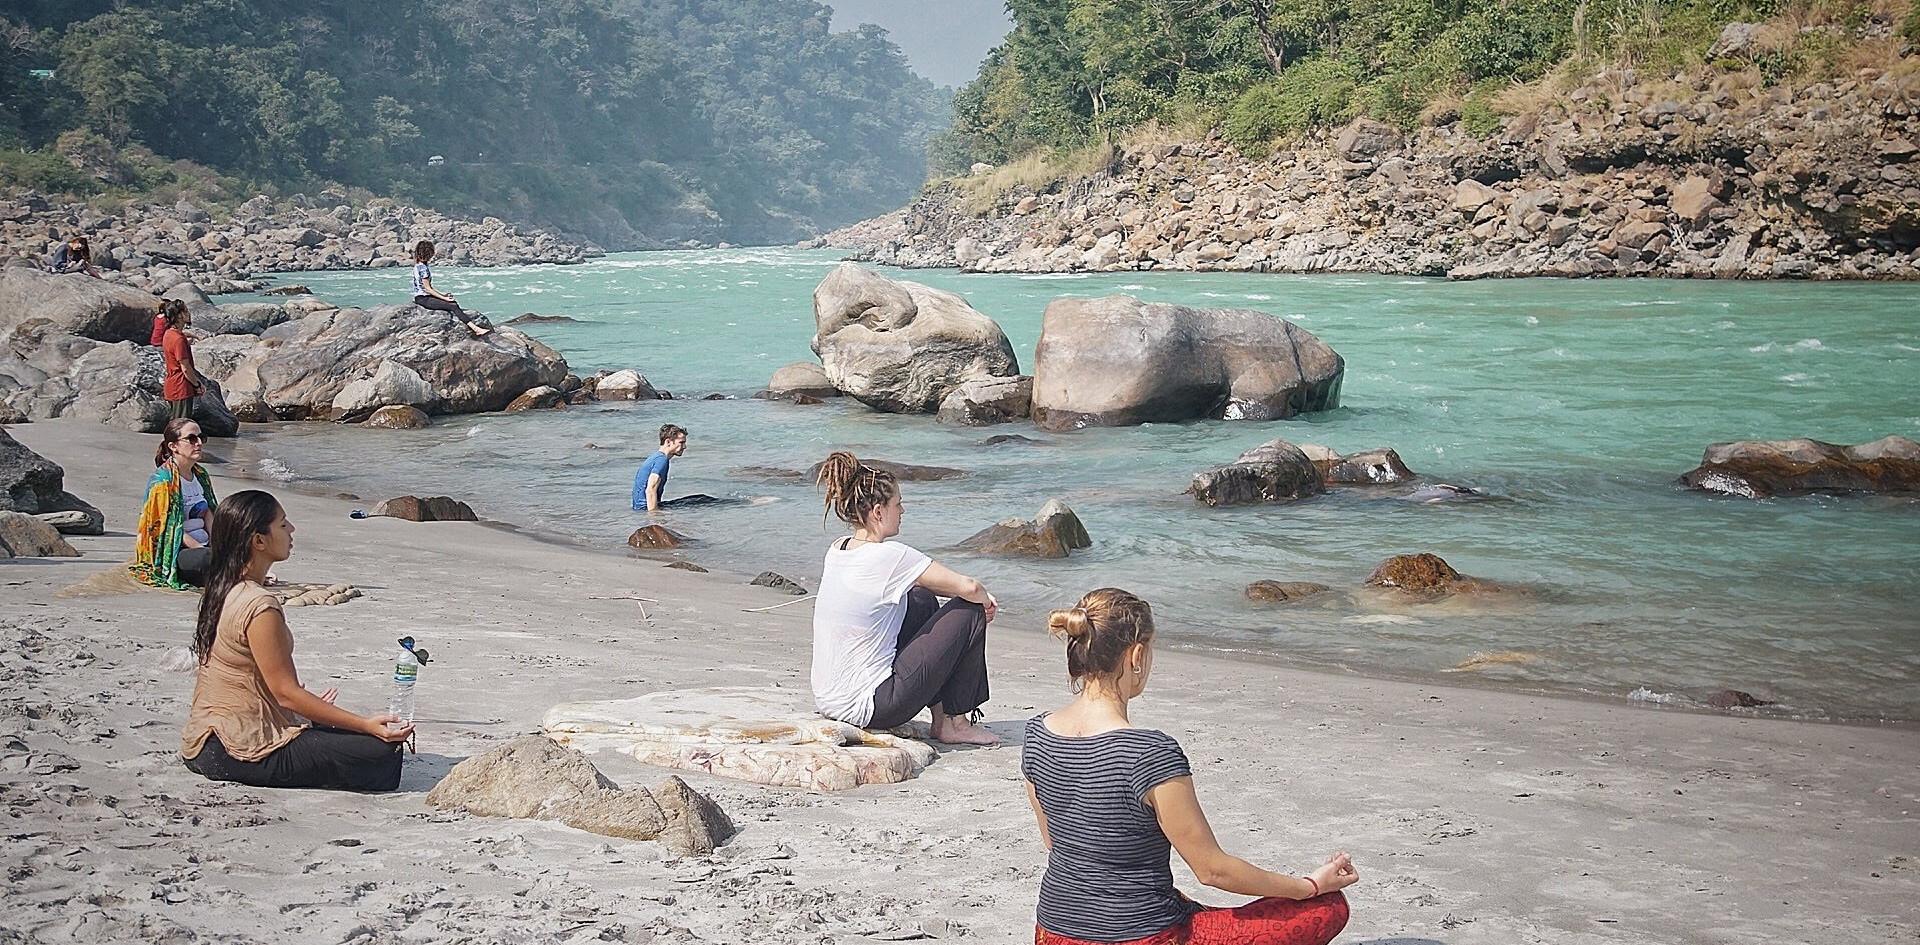 Ritual Bathing and Silent Meditation by the Ganga, Phool Chatti Ashram, Rishikesh